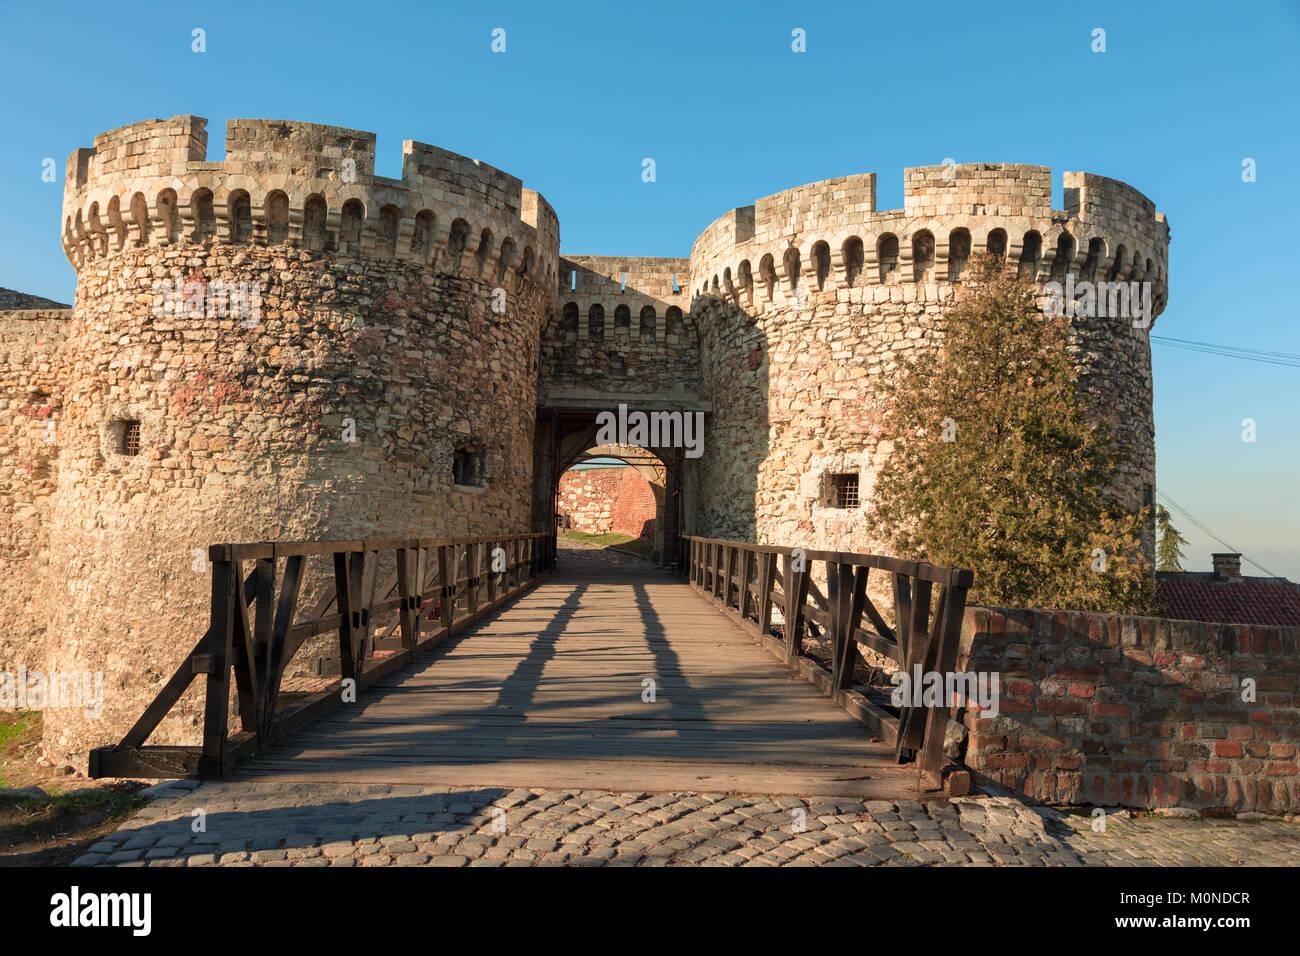 Walls and leafless trees of famous Kalemegdan castle in Belgrade - Stock Image